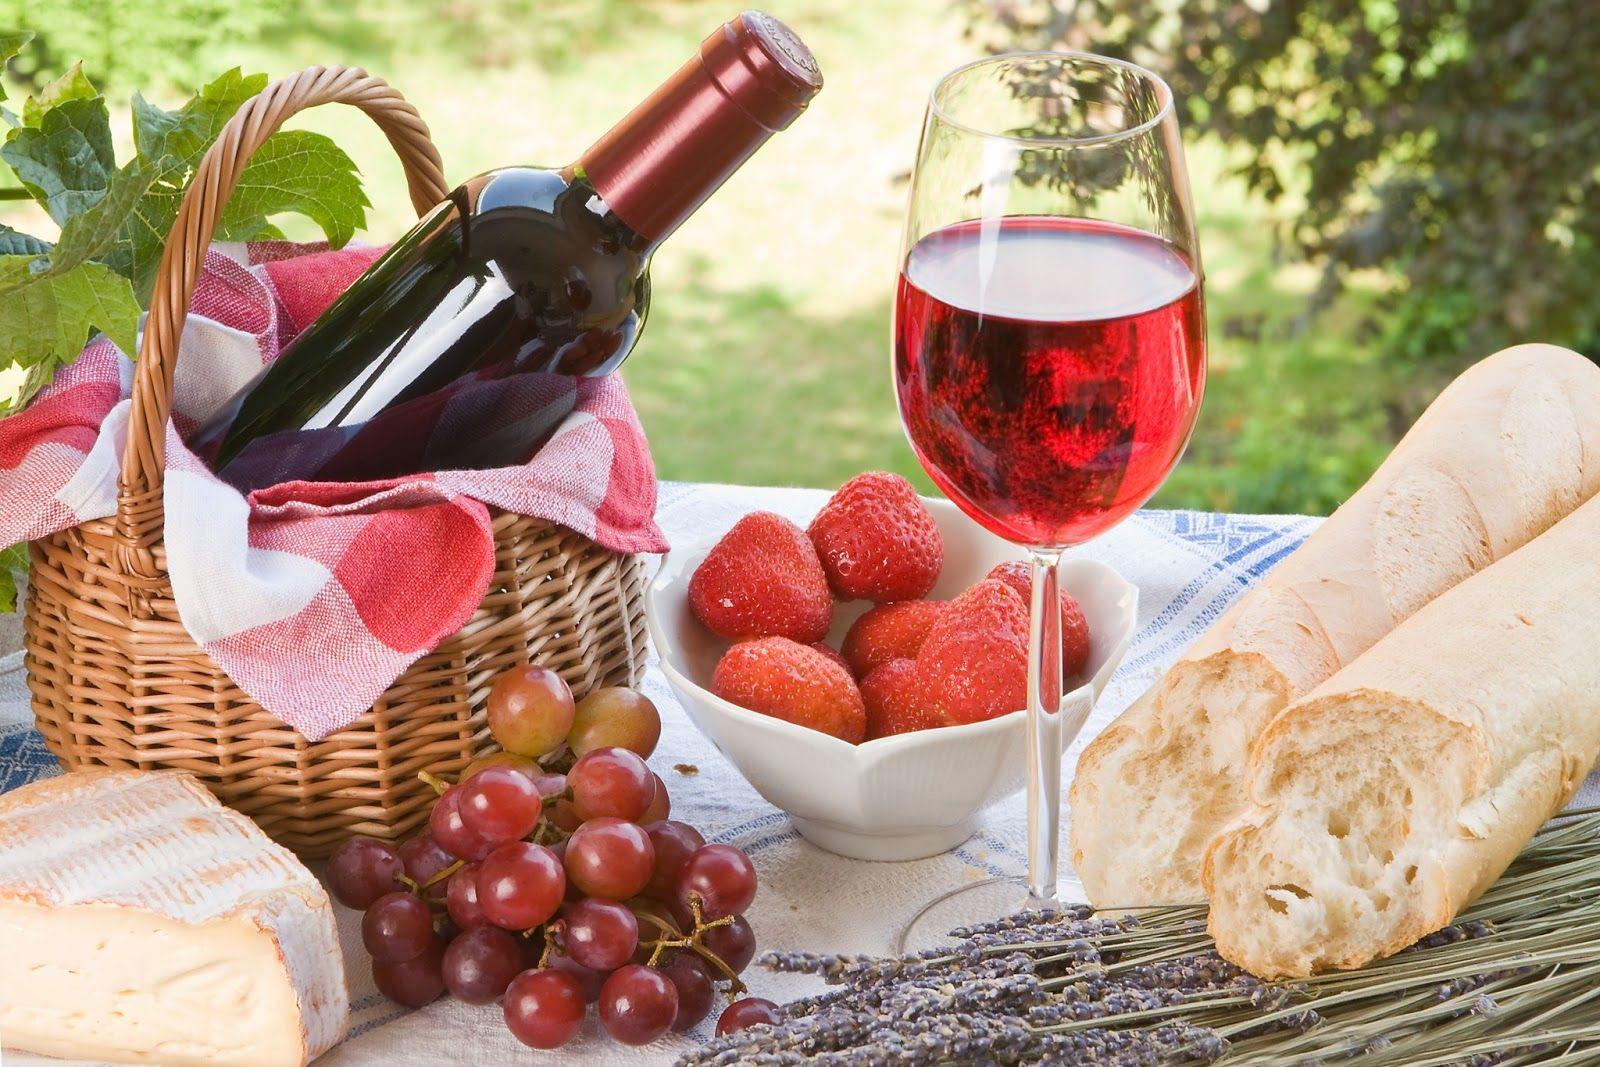 Beneficios Del Vino Tinto Picnic Foods Picnic Food Picnic Appetizers